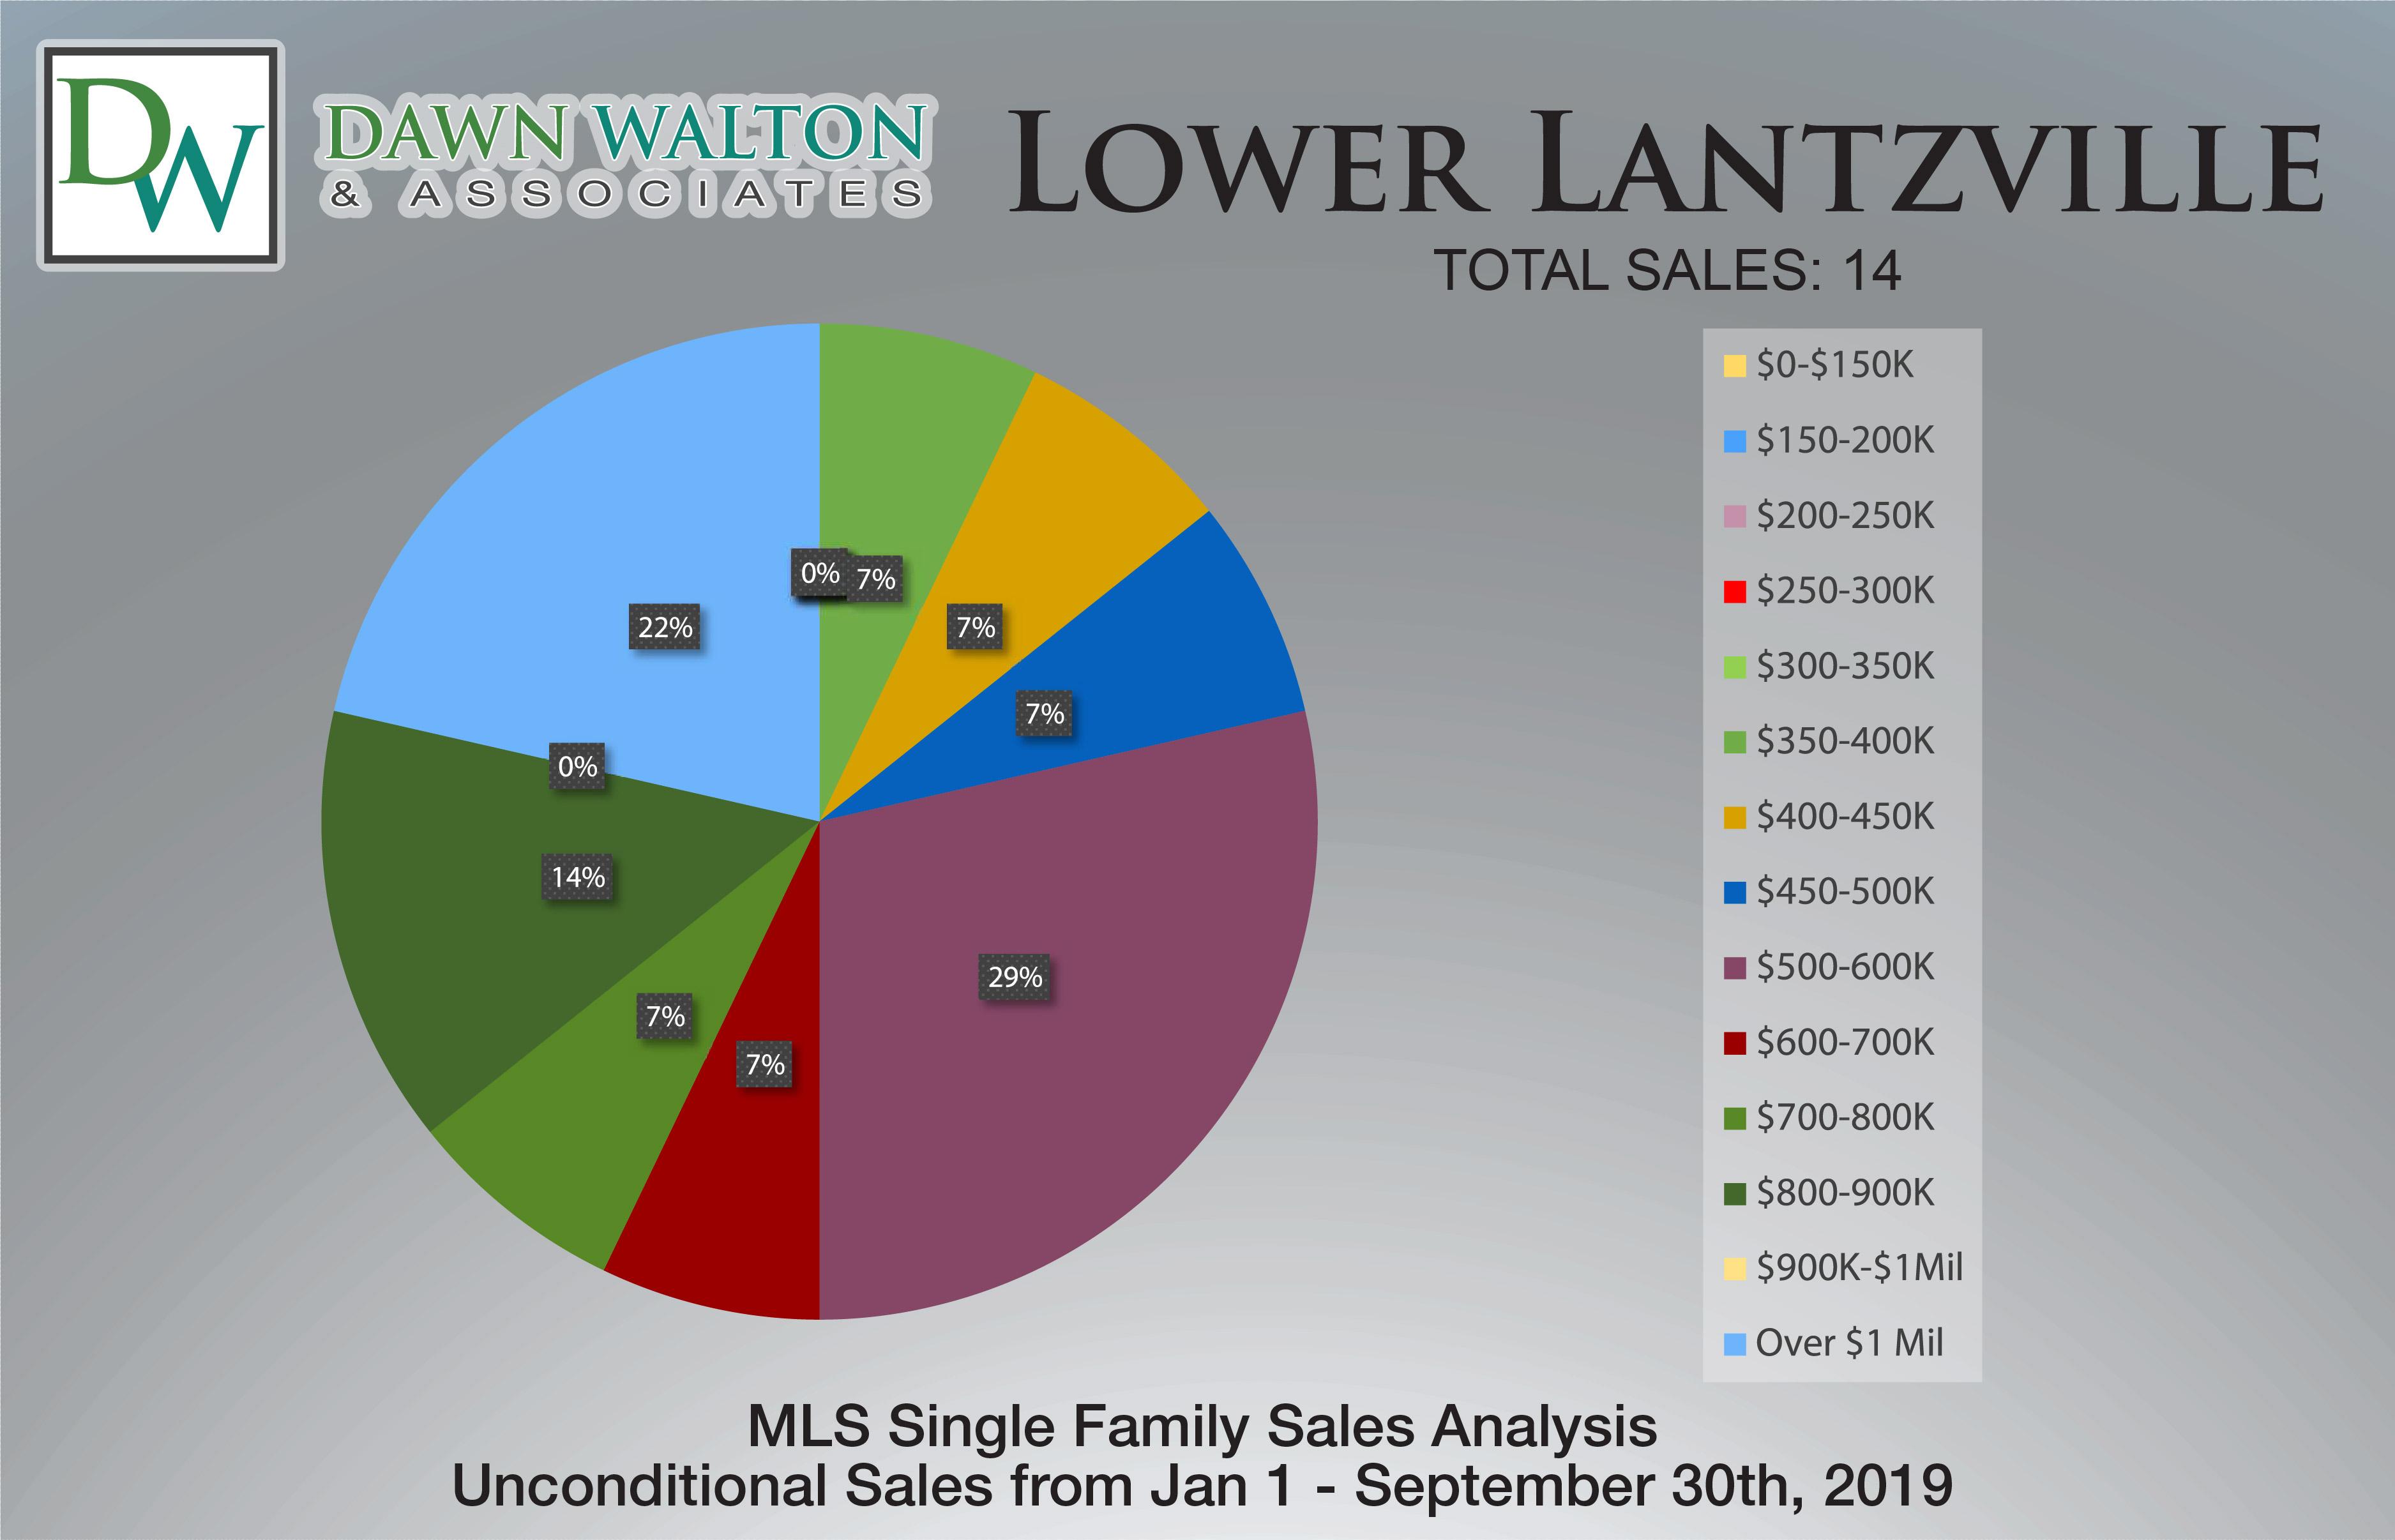 Lower Lantzville Real Estate Market Stats Price Percentage Jan 1-Sept 30 2019 - Nanaimo Realtor Dawn Walton